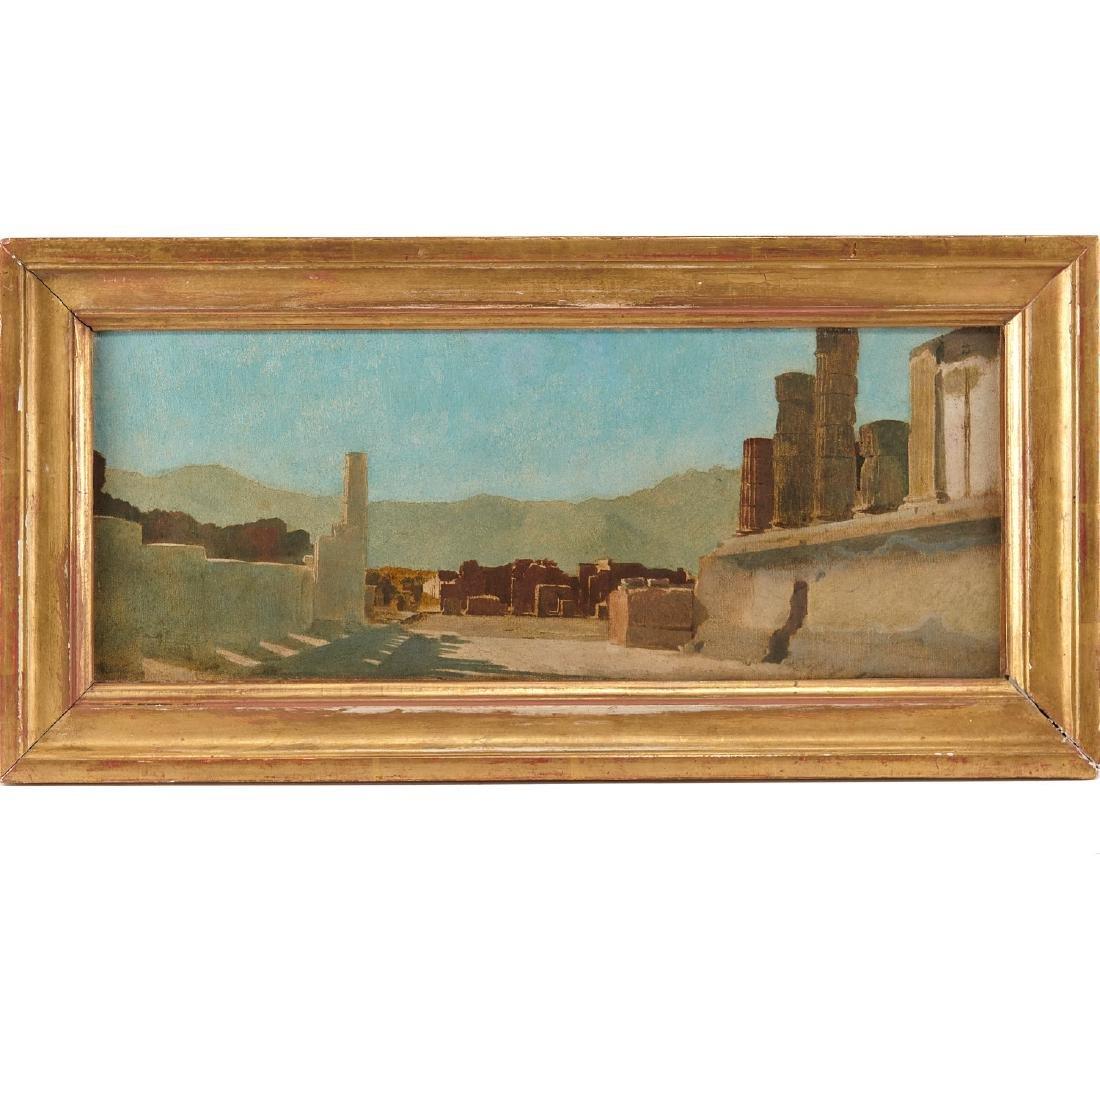 Claude-Ferdinand Gaillard, Vue de Pompei, c. 1887